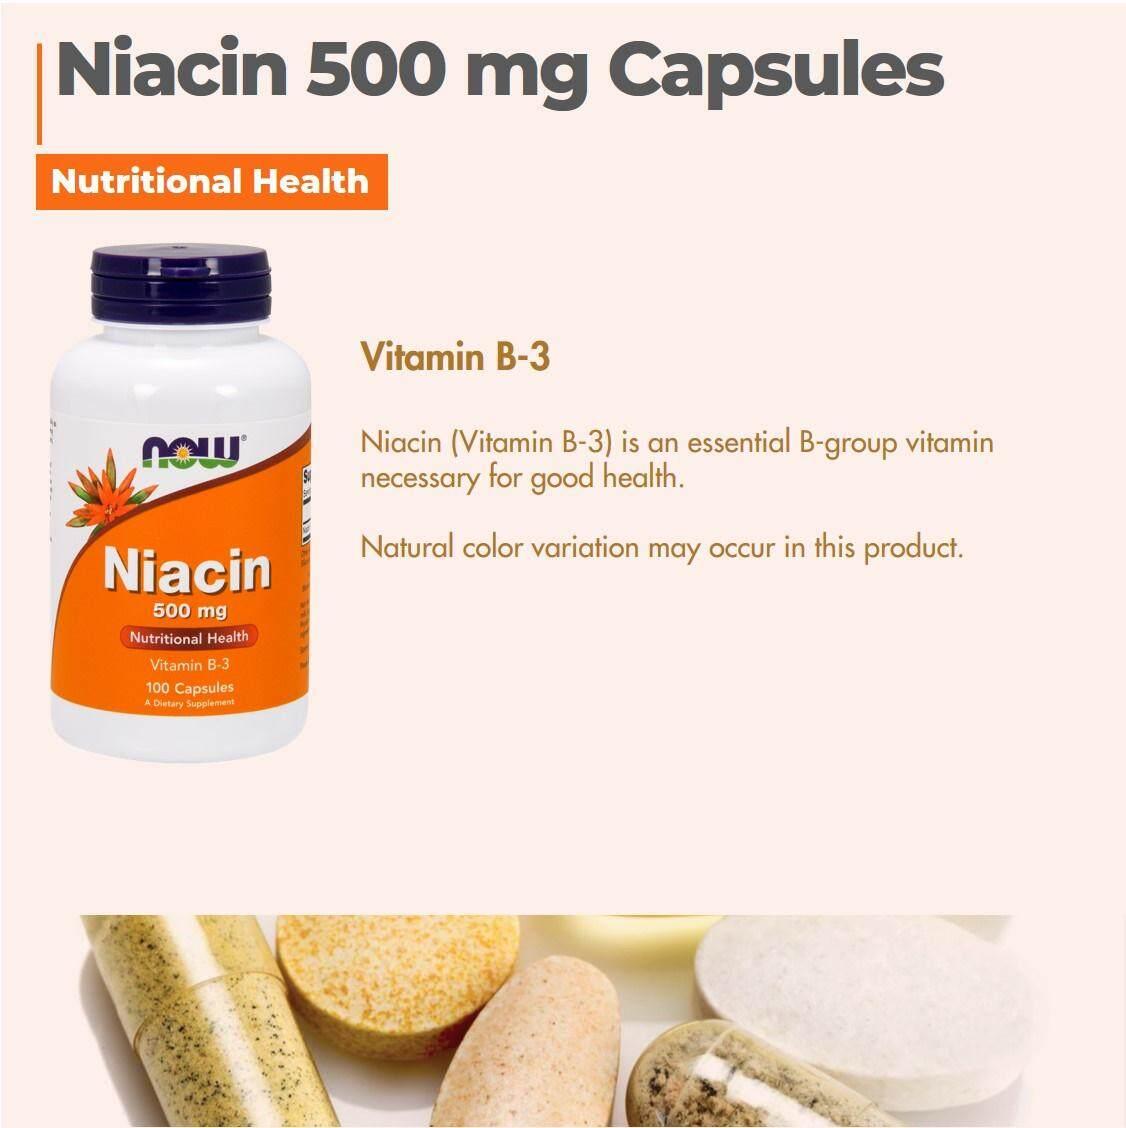 Now Foods, Niacin, 500 mg, Kulit kecantikan 100 Capsules